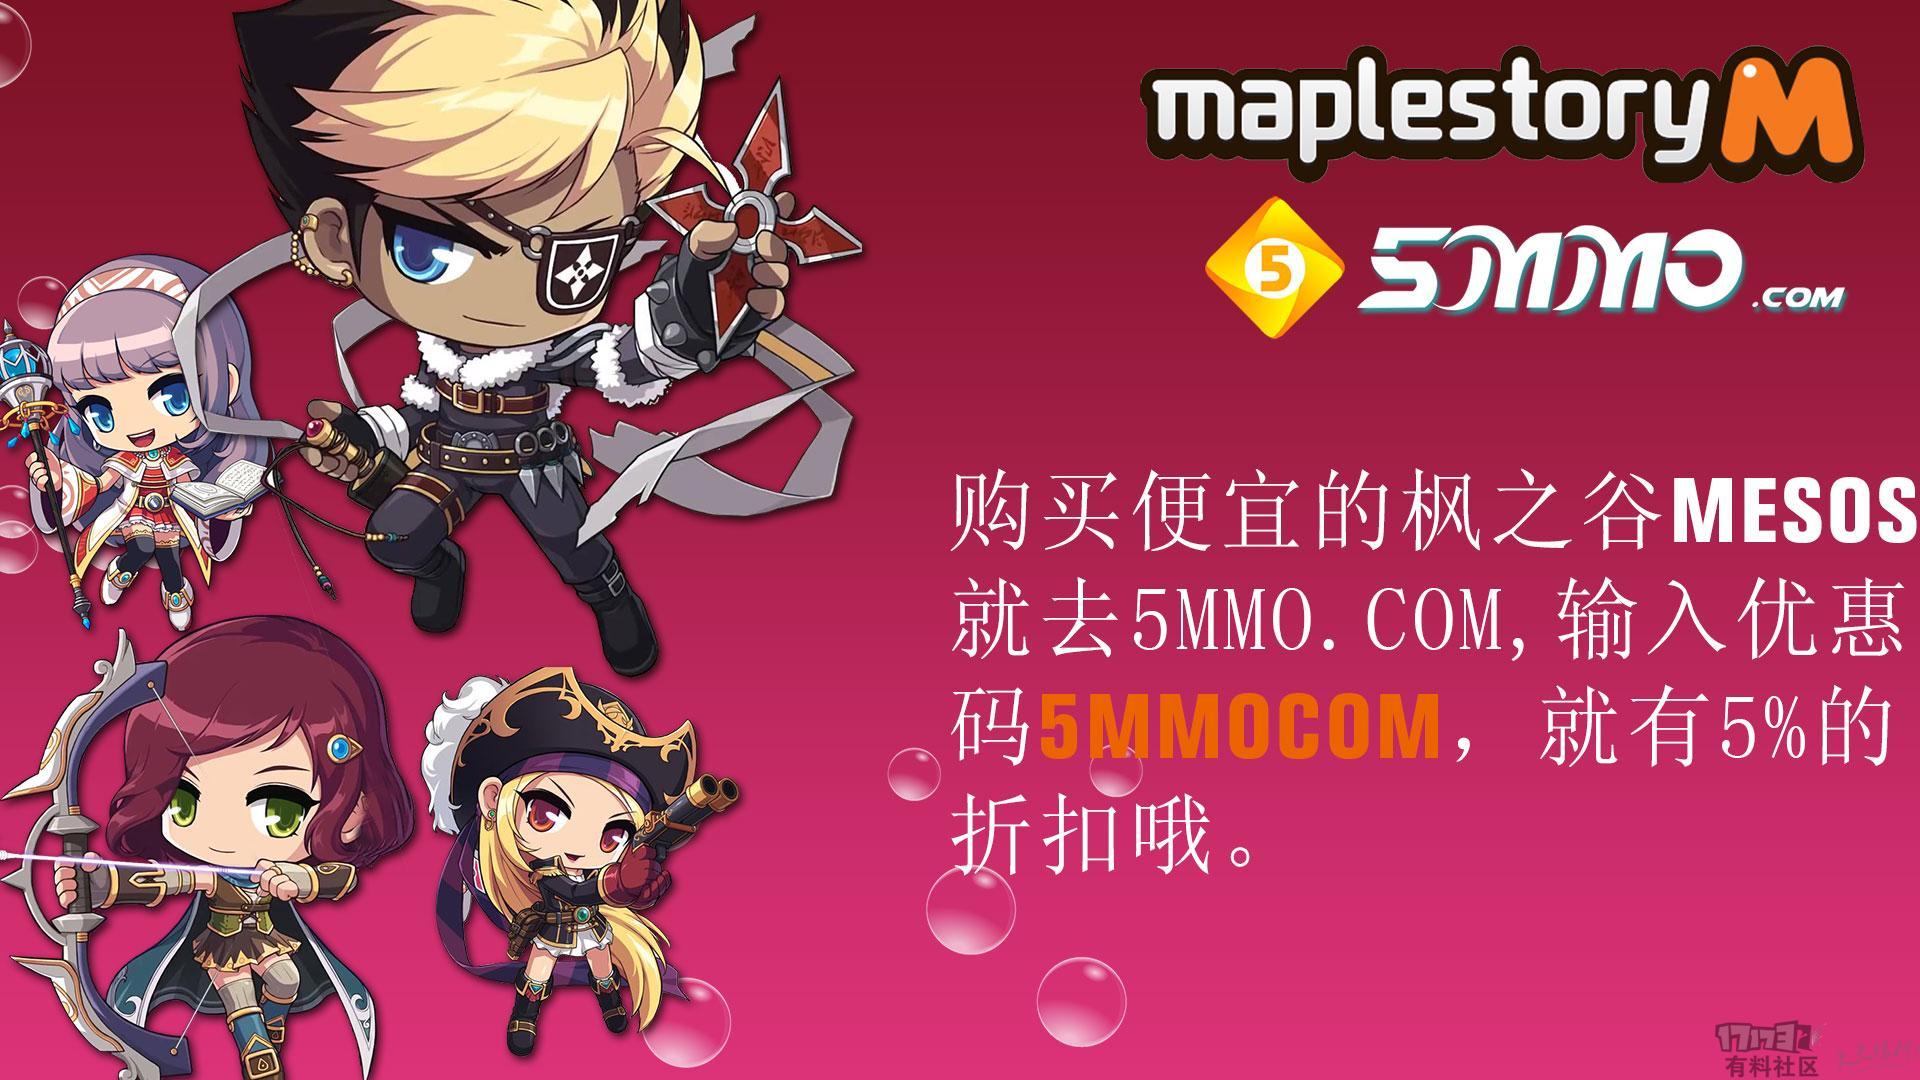 Maplestory-M.jpg